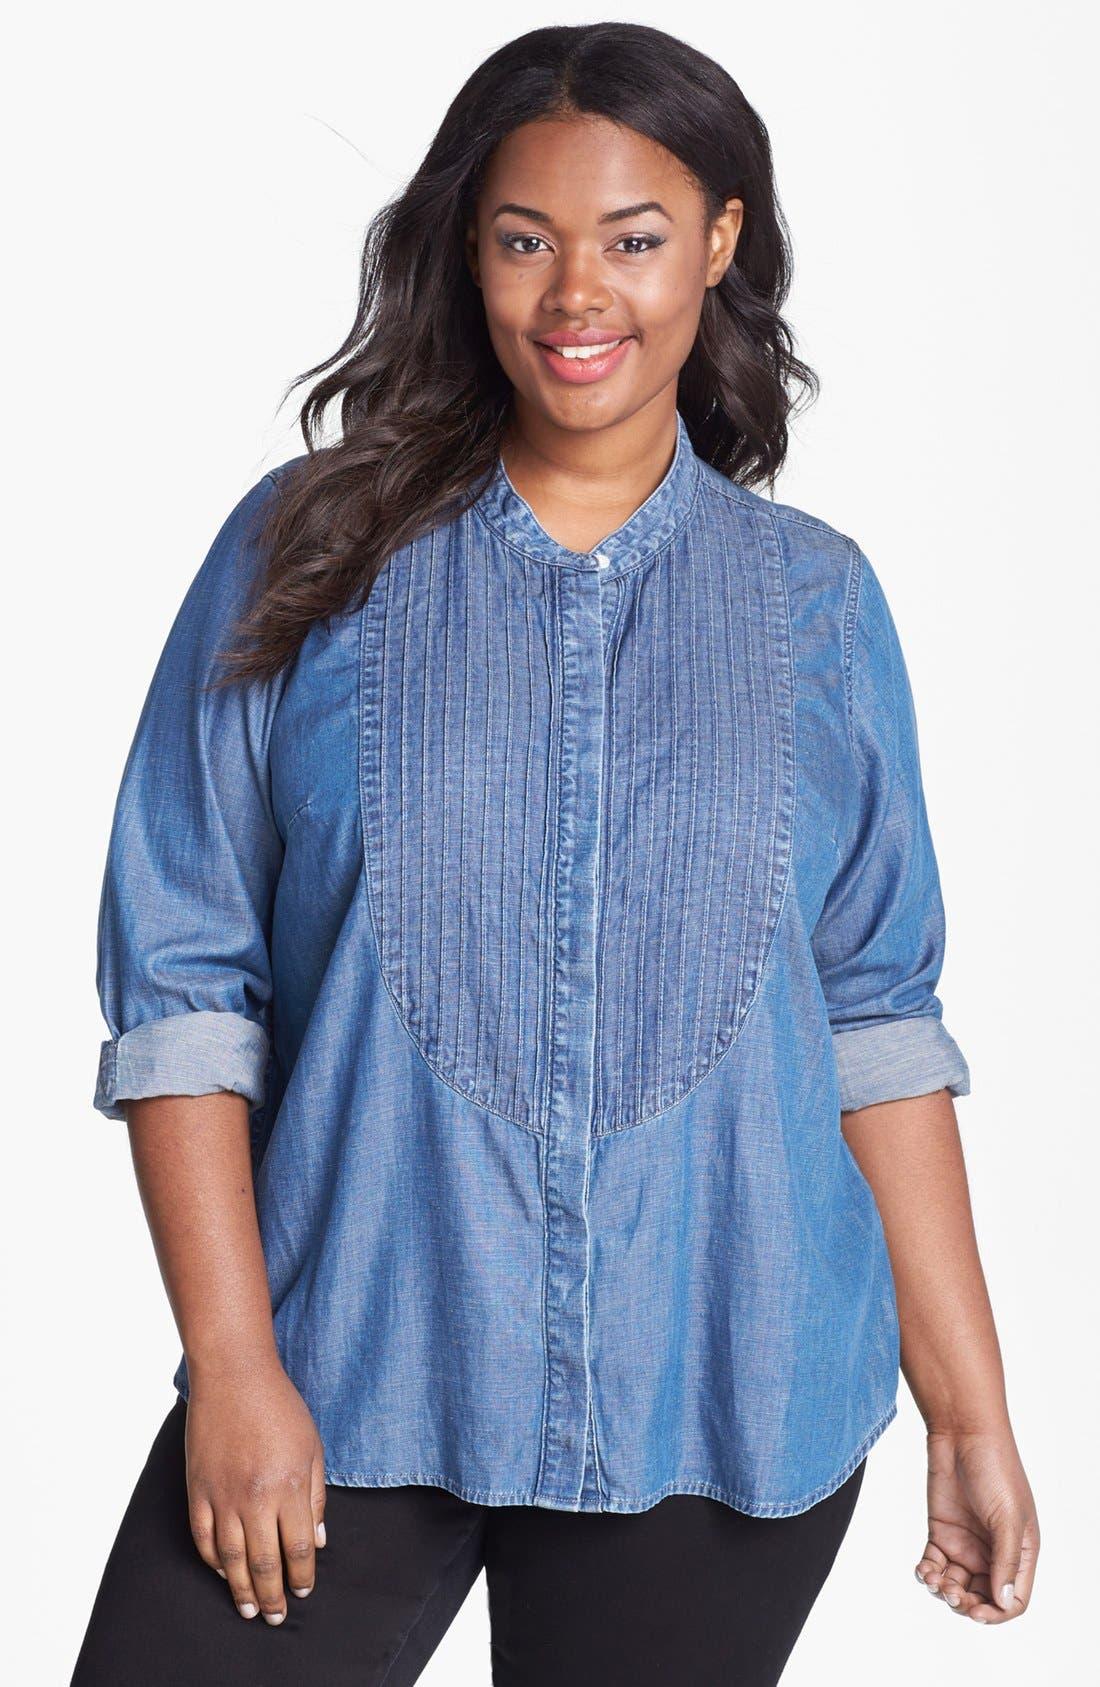 Alternate Image 1 Selected - Lucky Brand Chambray Tuxedo Shirt (Plus Size)